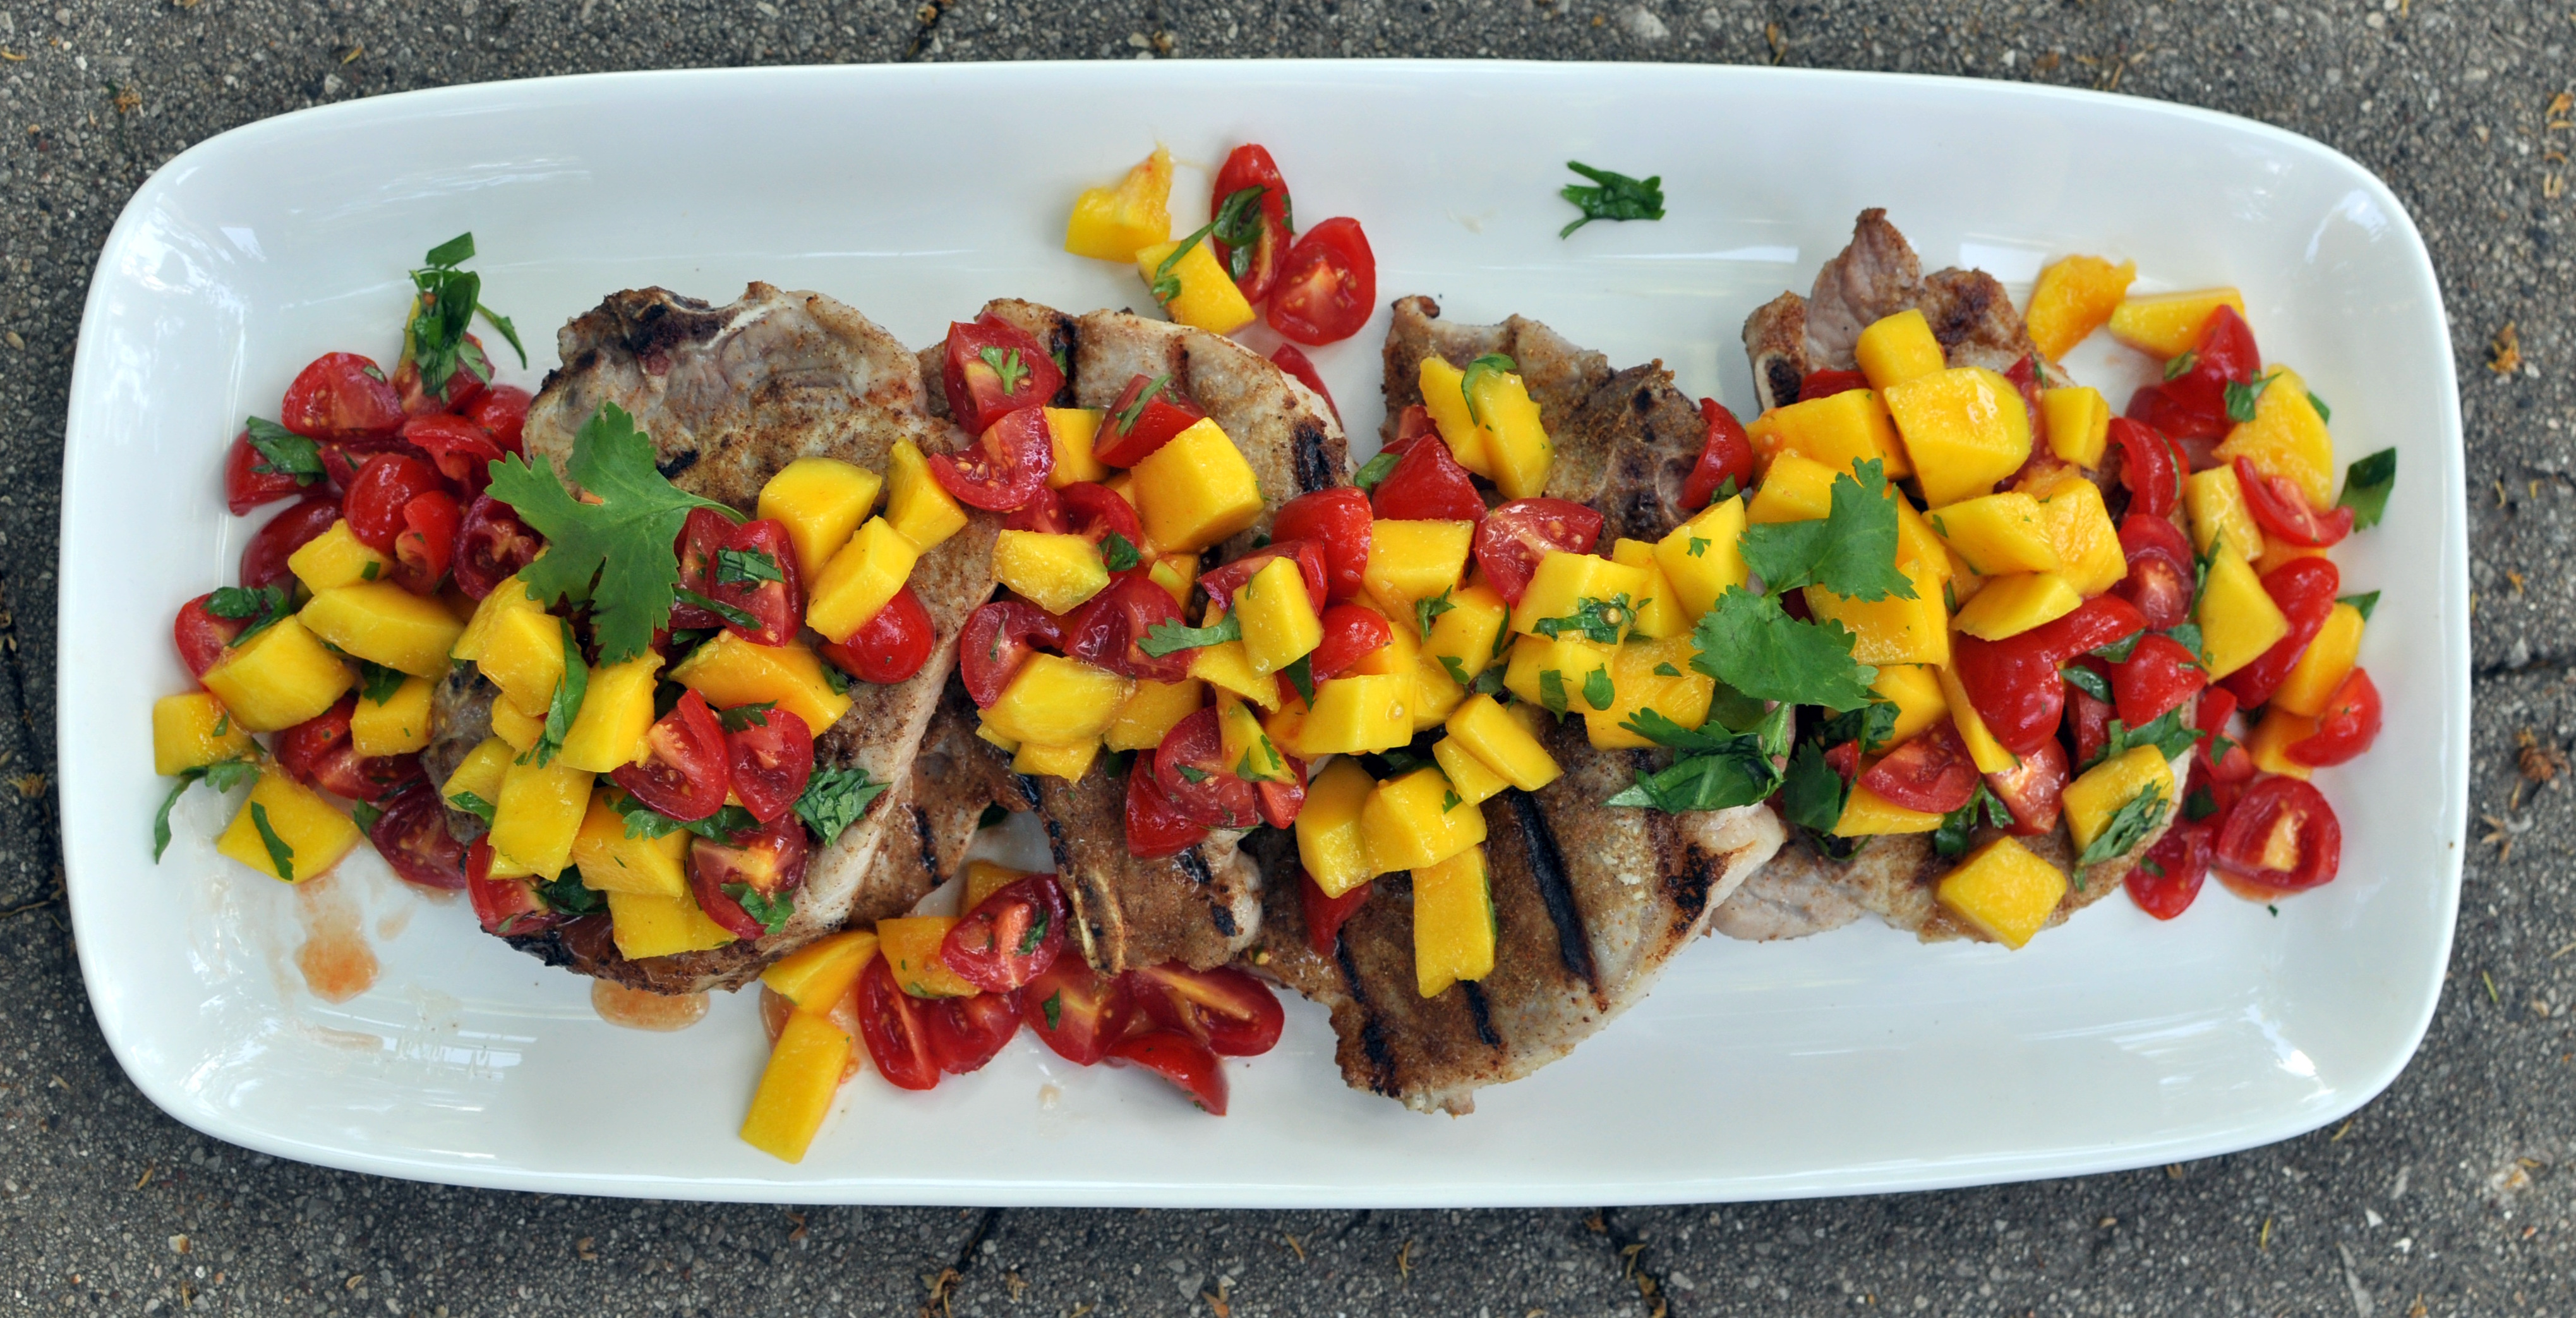 Pork Chops with Caribbean Rub and Mango Salsa